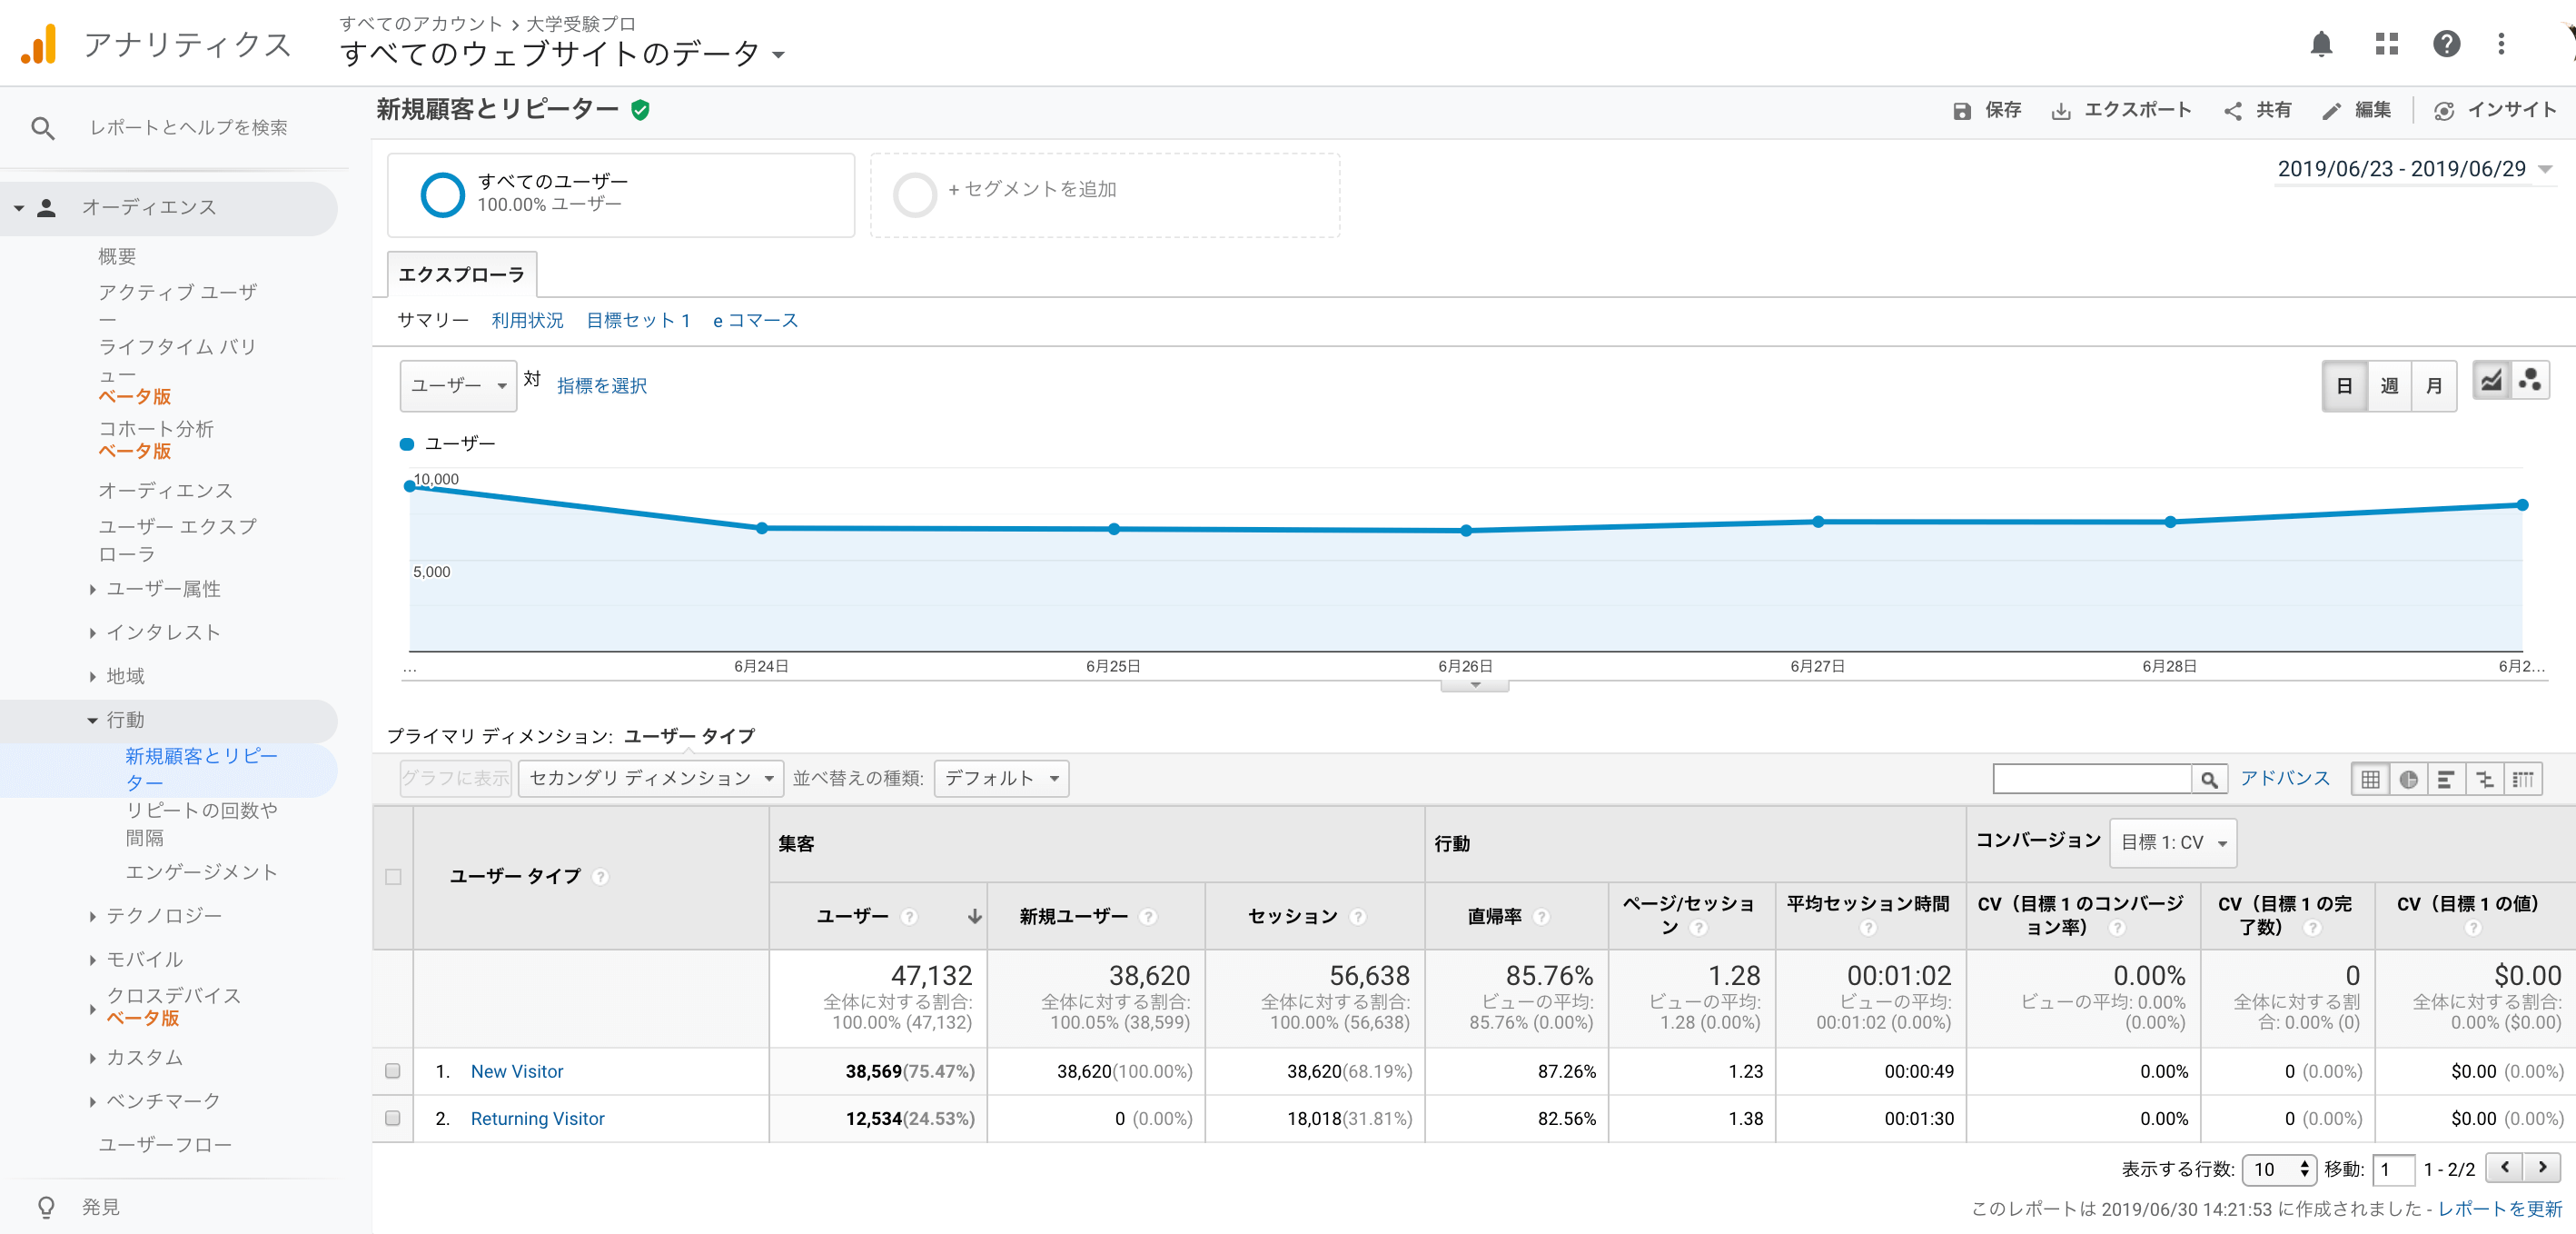 google analyticsのユーザーレポートの新規顧客とリピーター